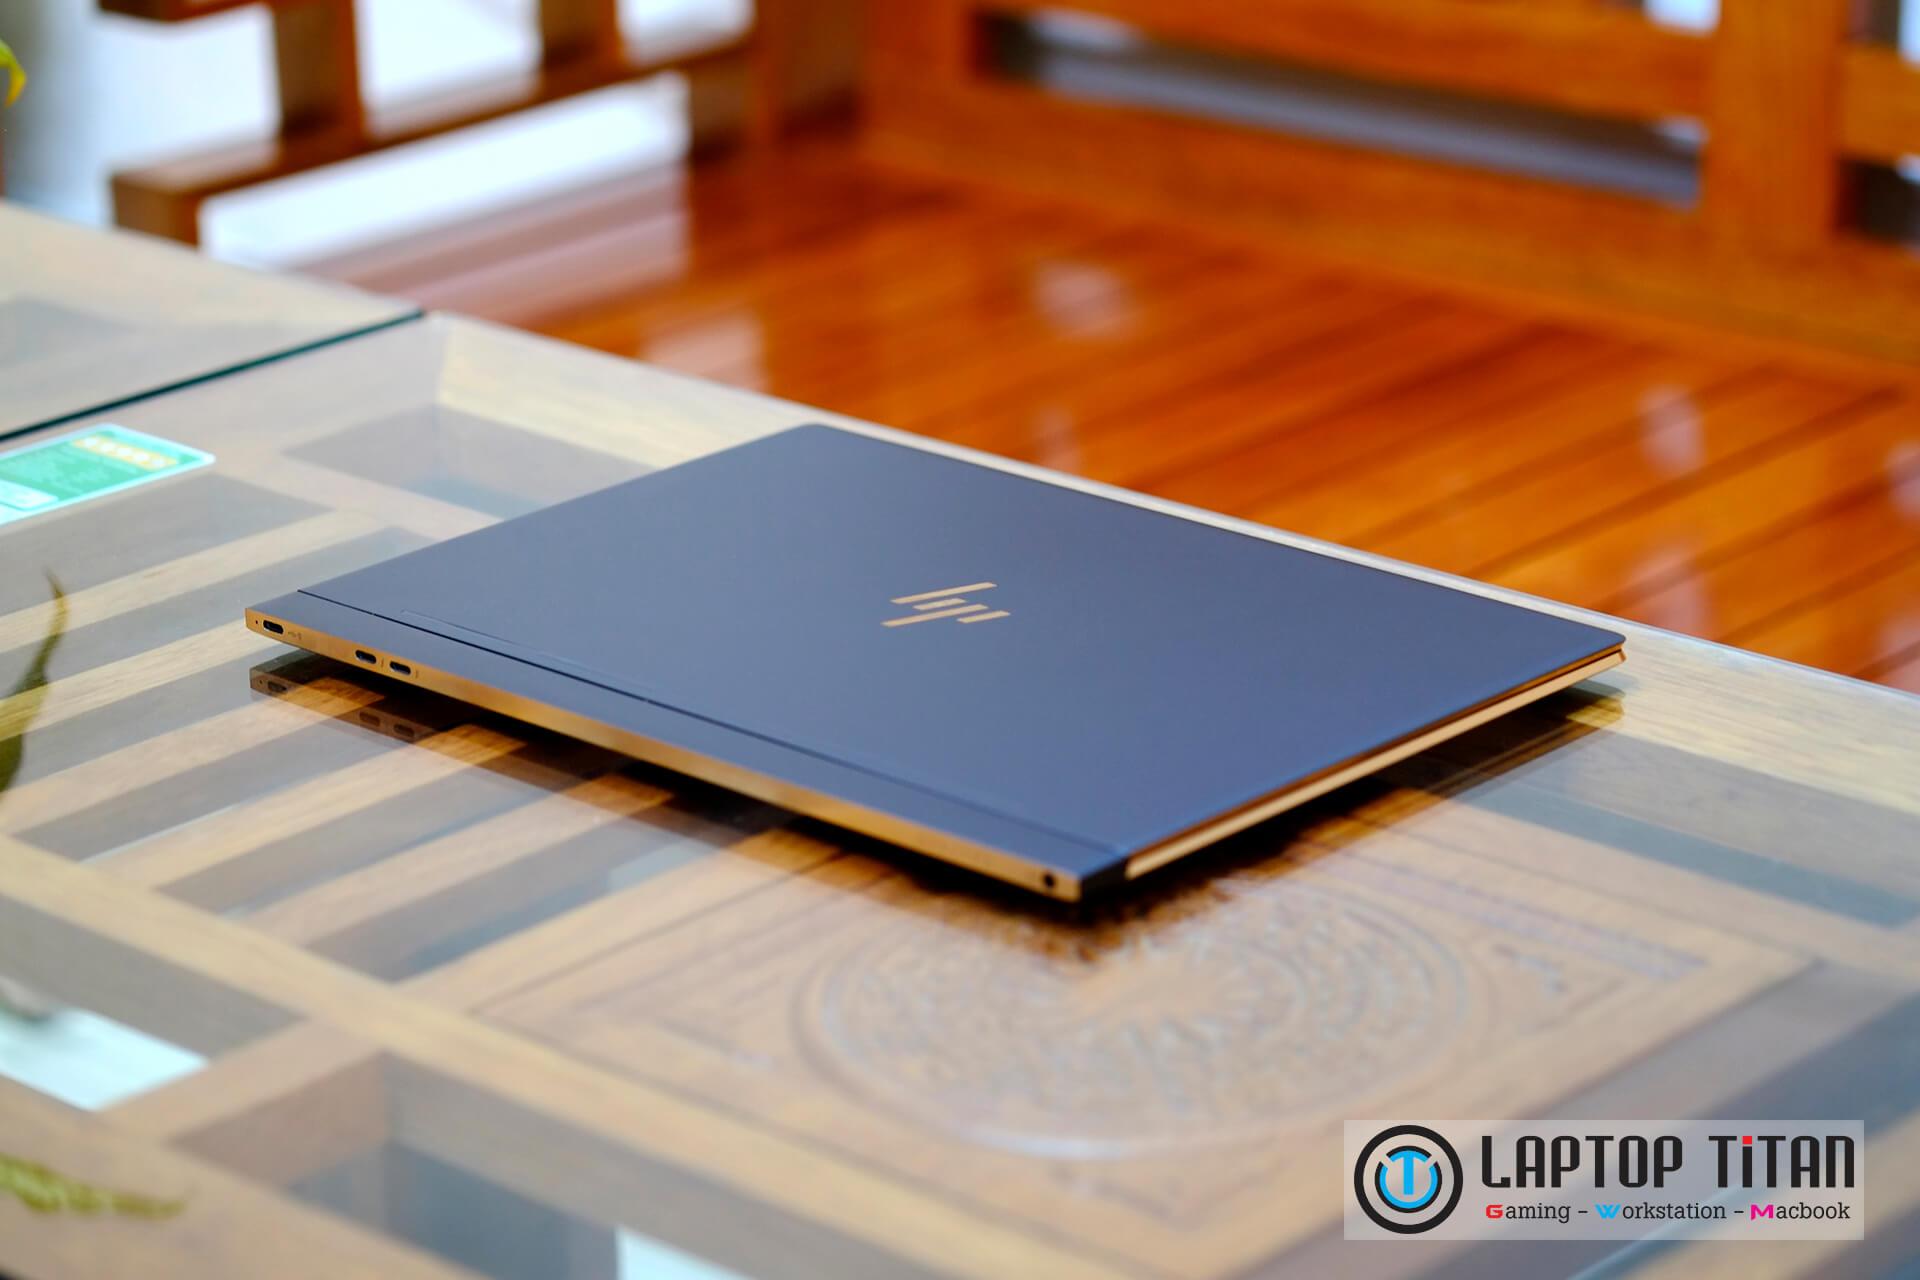 "HP Spectre 13 Core i7 8550u / 16GB / 512GB / 13.3"" UHD Touch / Black Gold / 1.1 Kg"